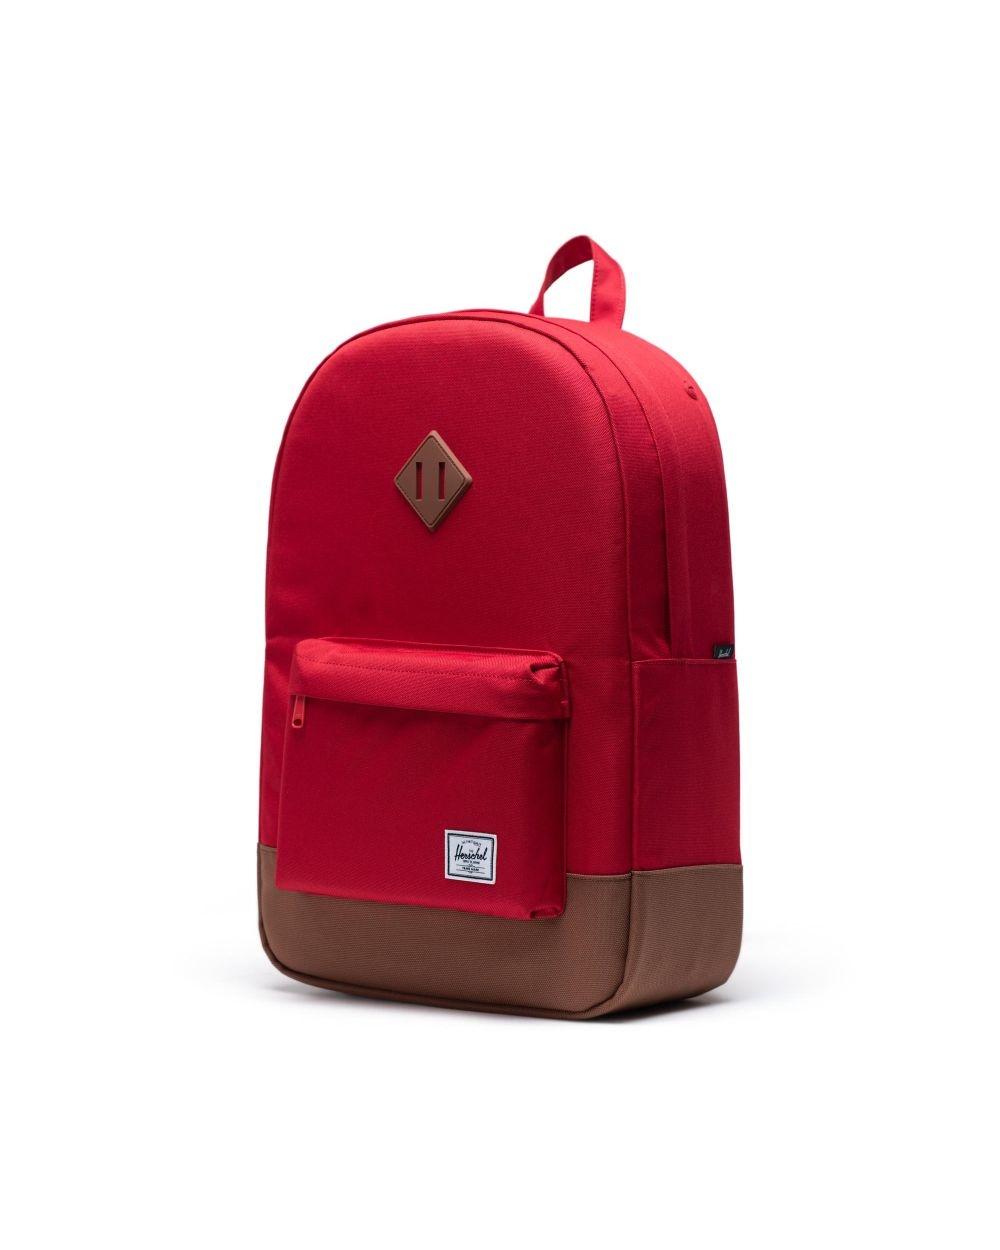 Heritage Red/Saddle brown-3